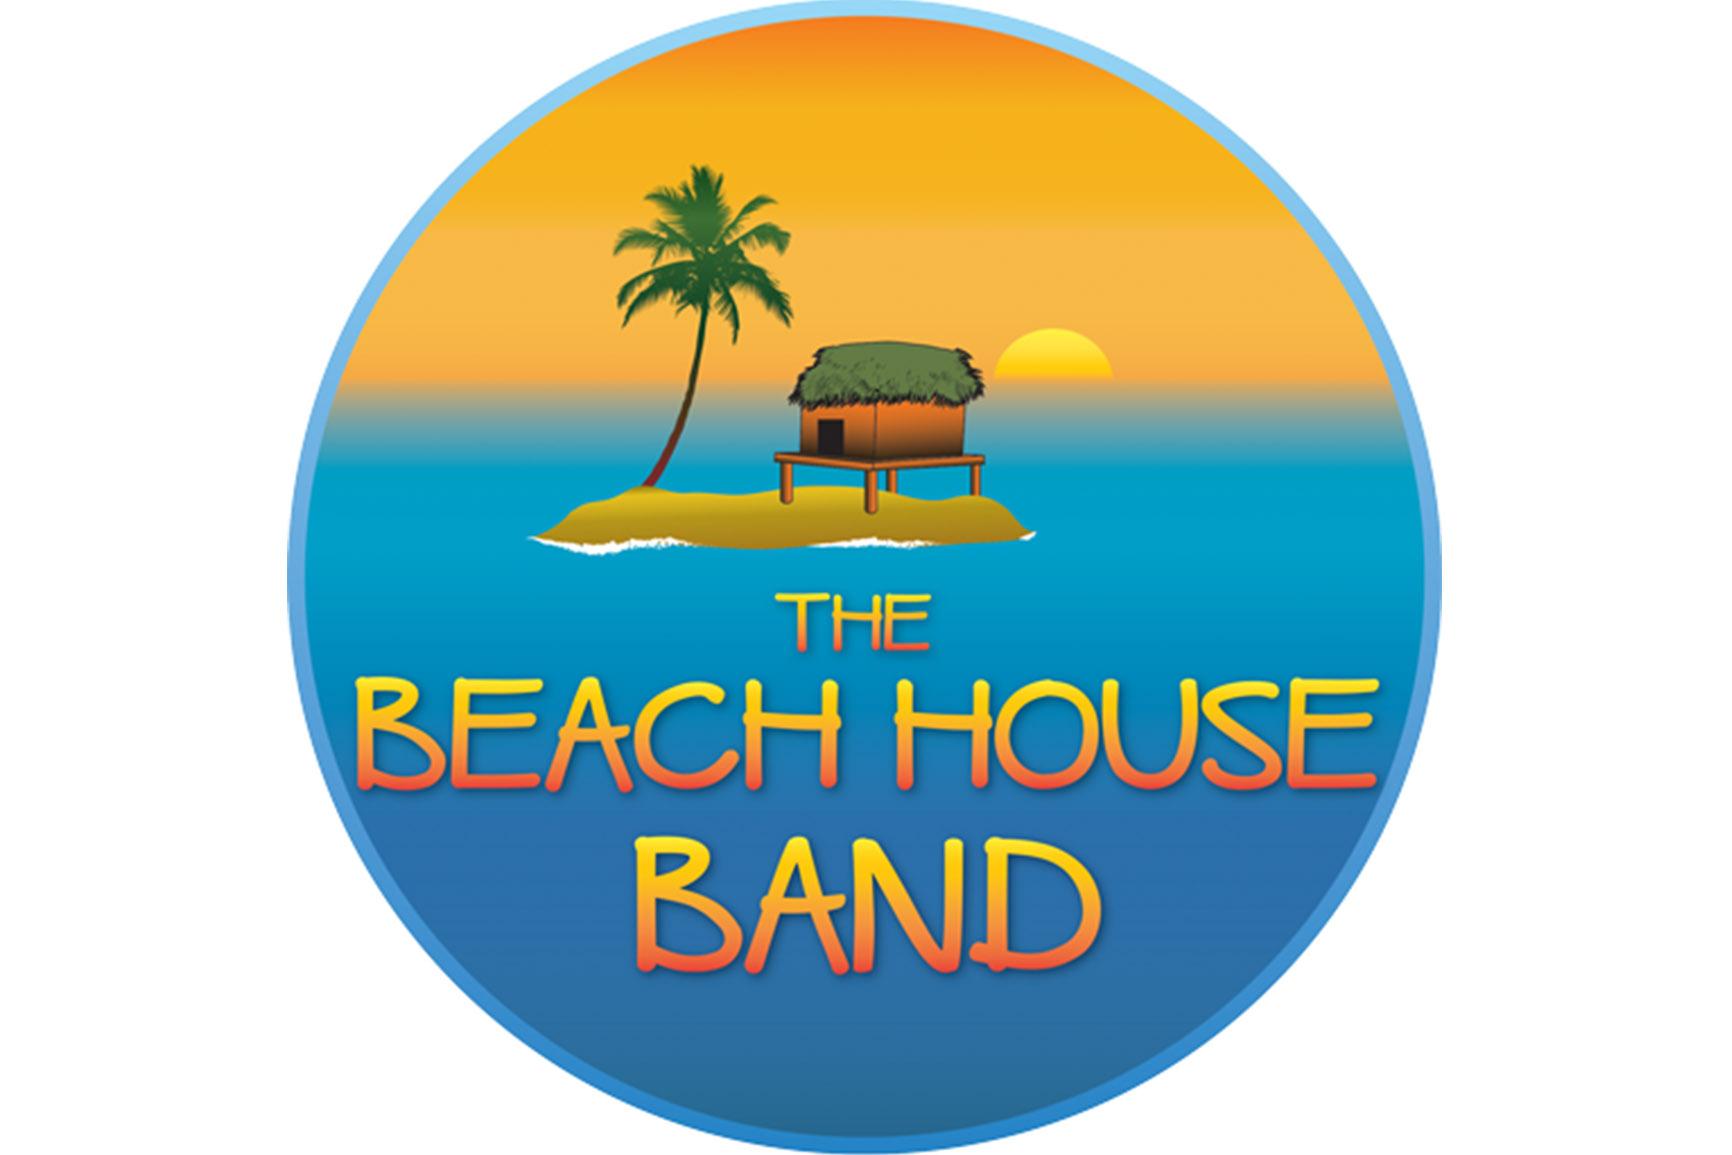 The Beach House Band